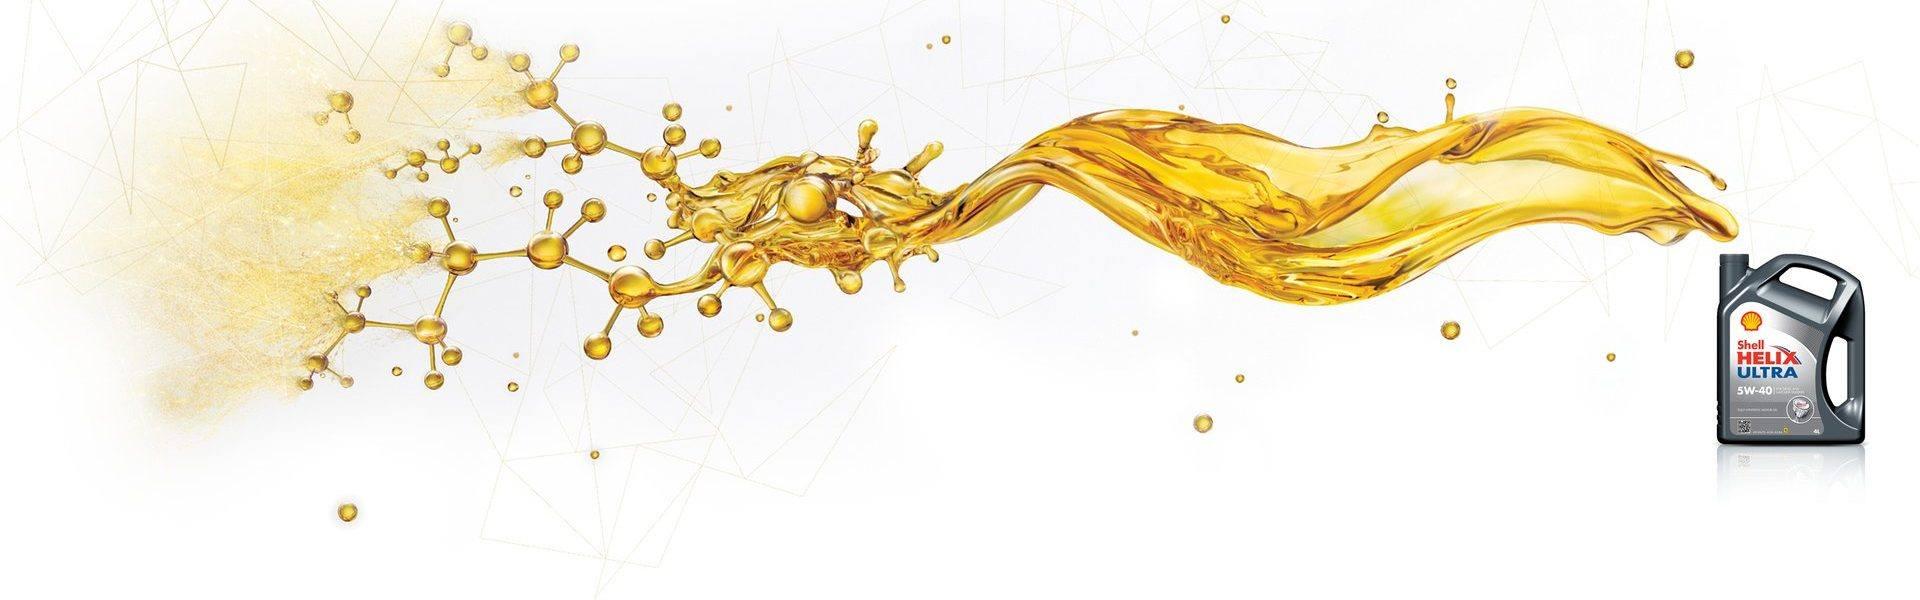 Shell Helix Ultra oil